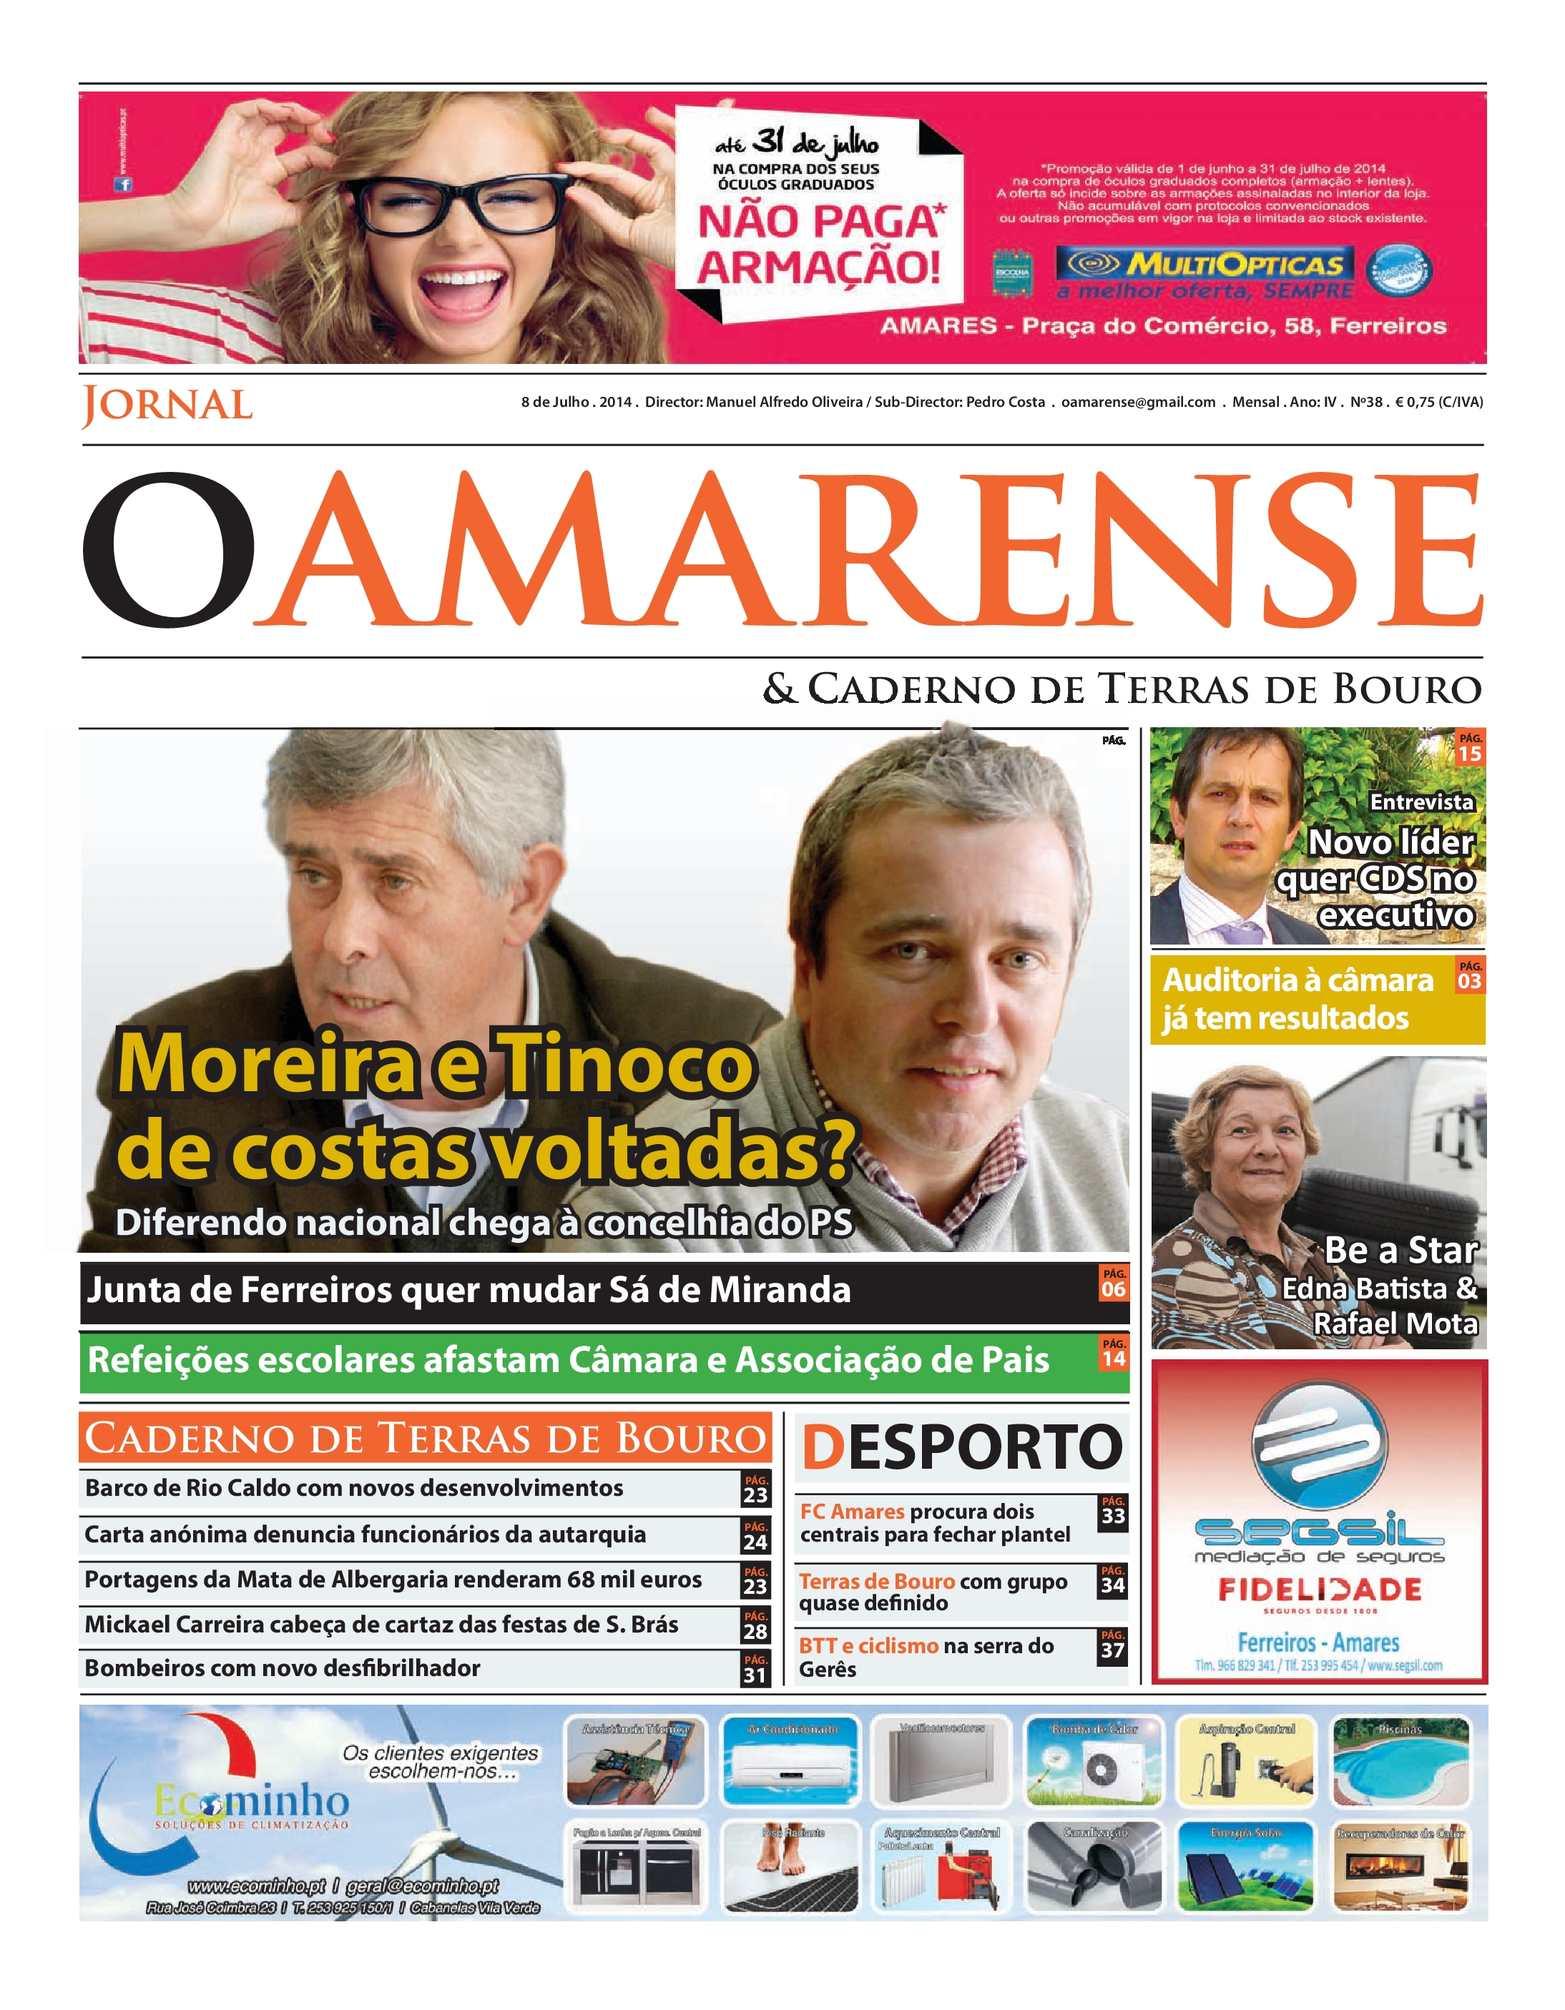 Calaméo - O Amarense Julho 2014 Web bfd14498cf